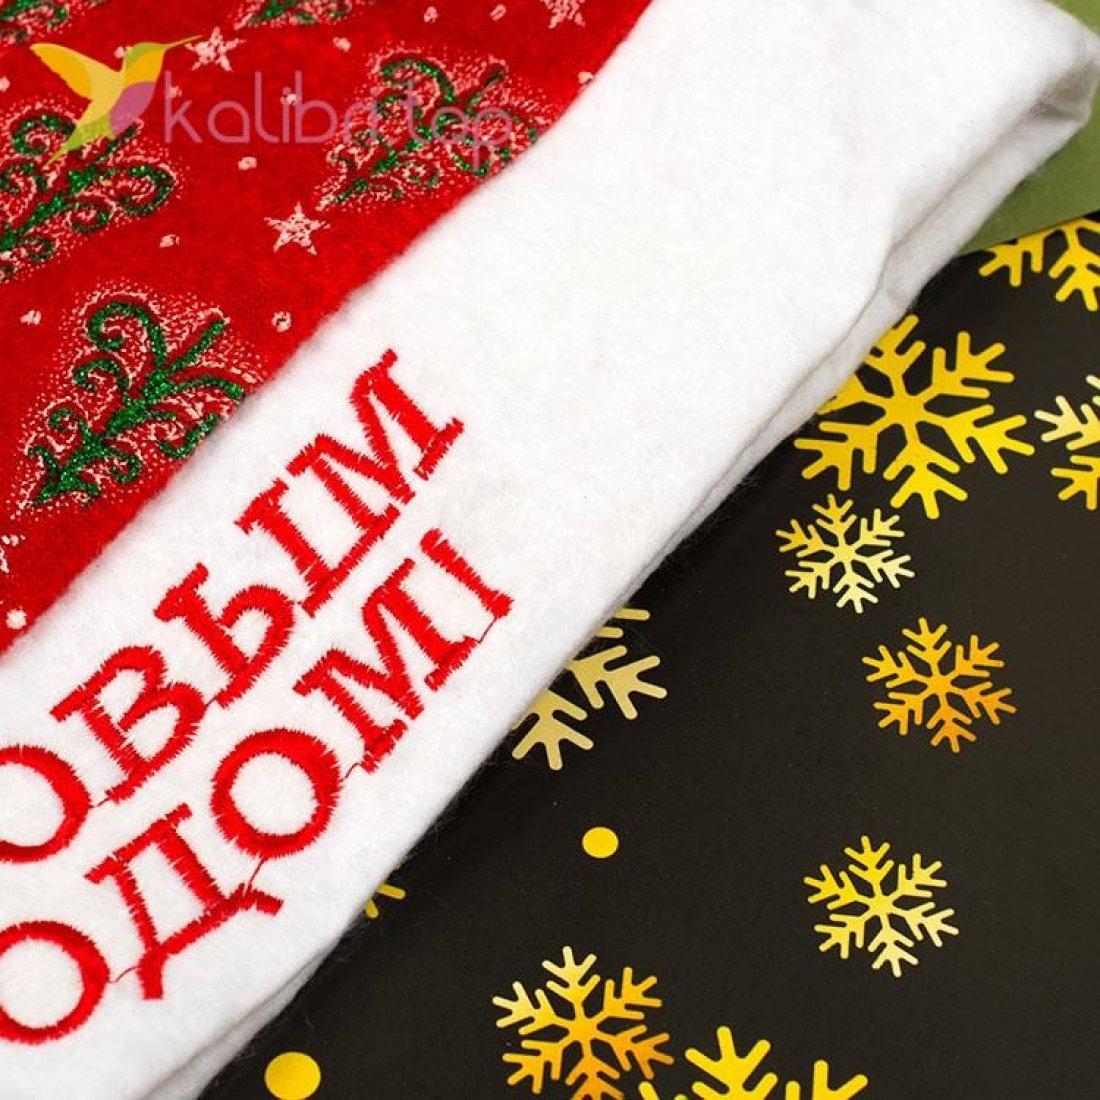 Новогодняя шапка Деда Мороза ёлочки, оптом фото 2